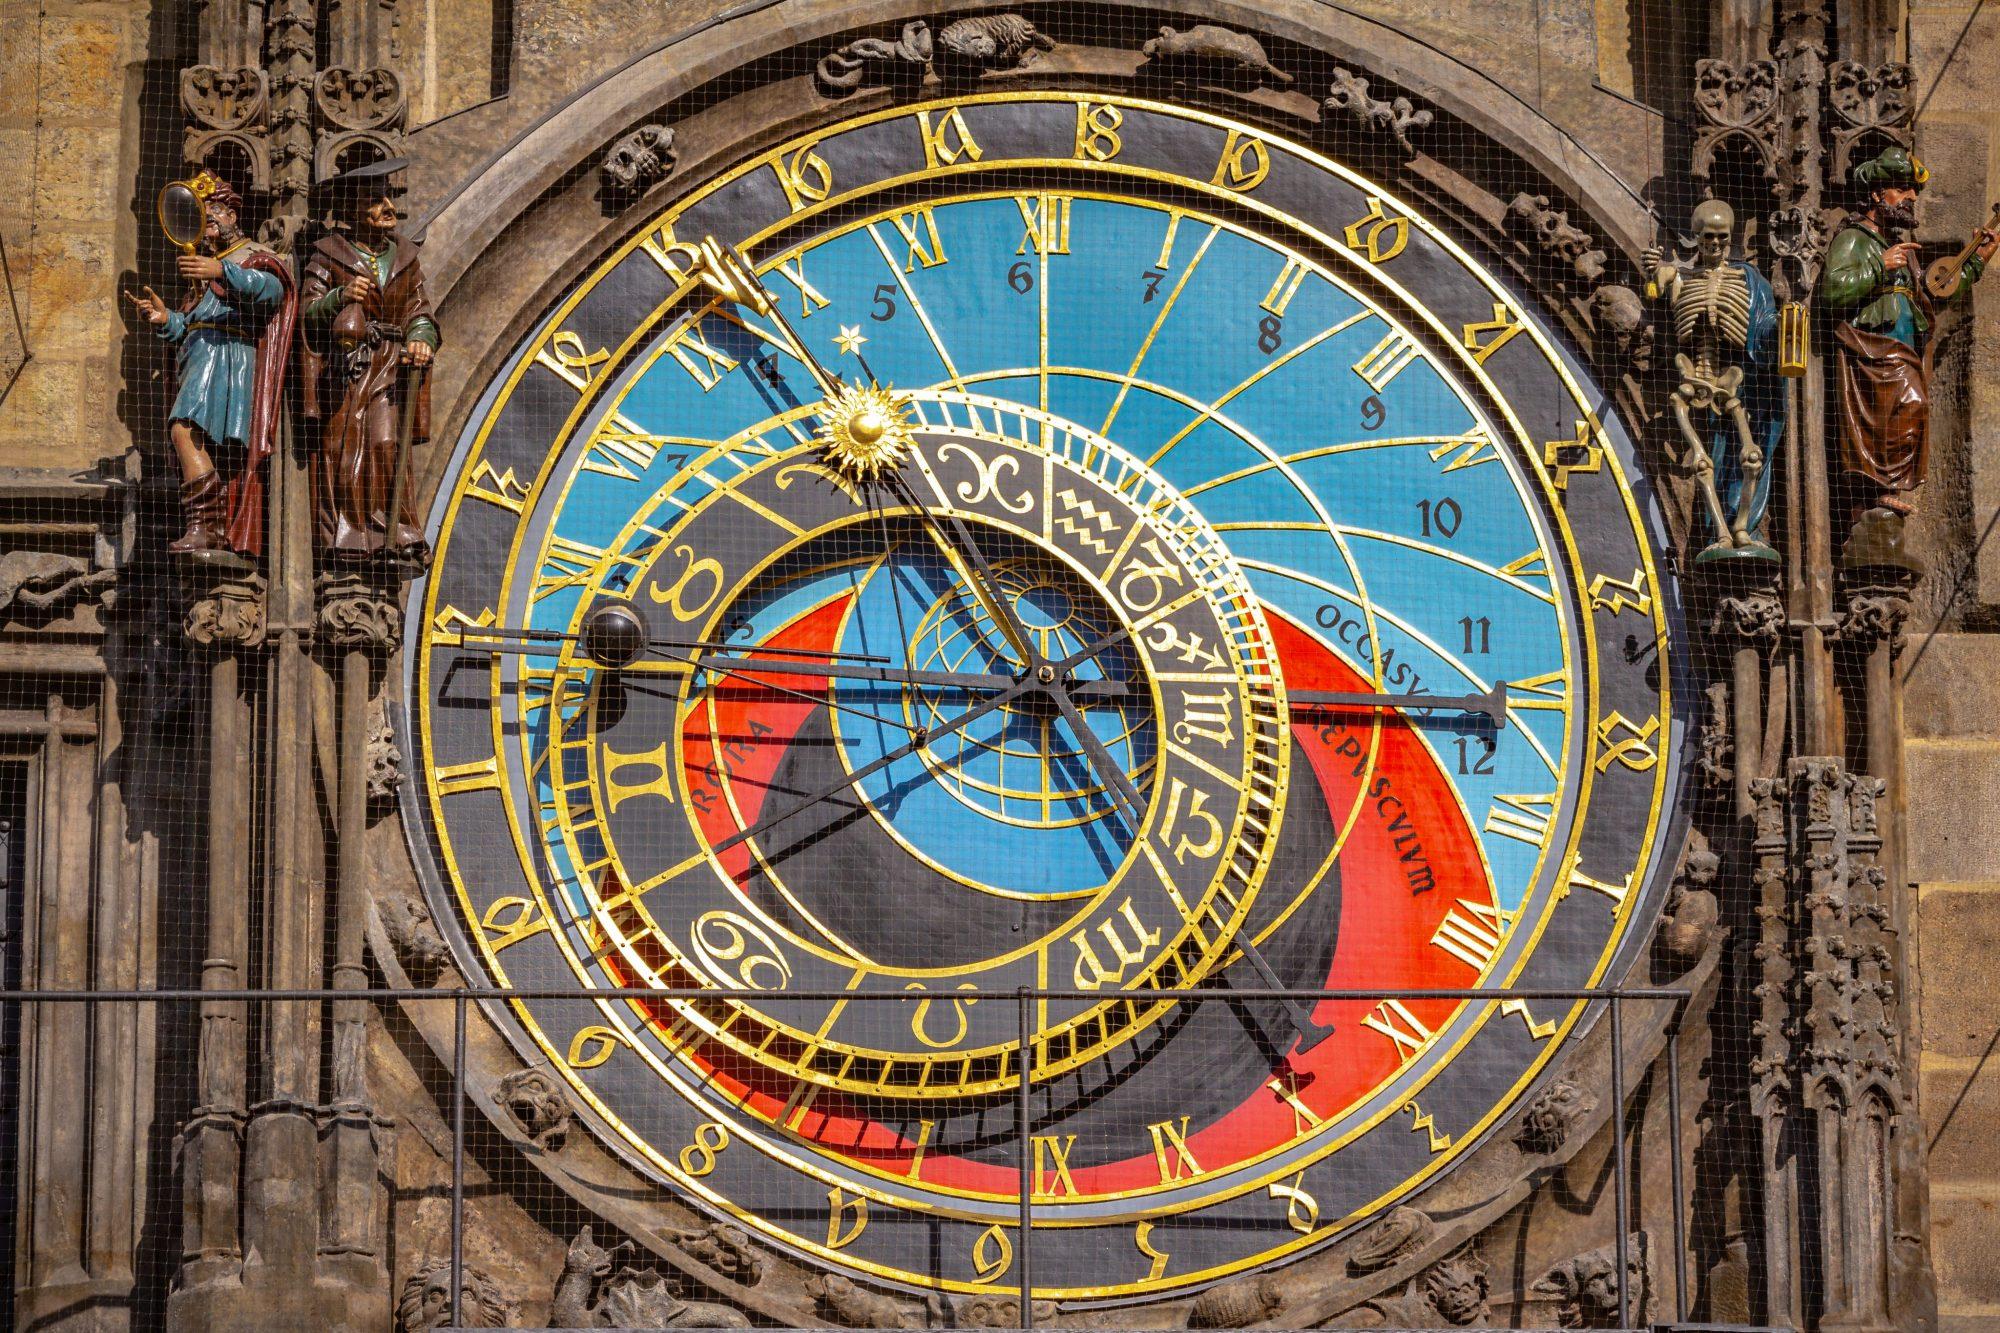 Astronomical dial of Astronomical Clock in Prague